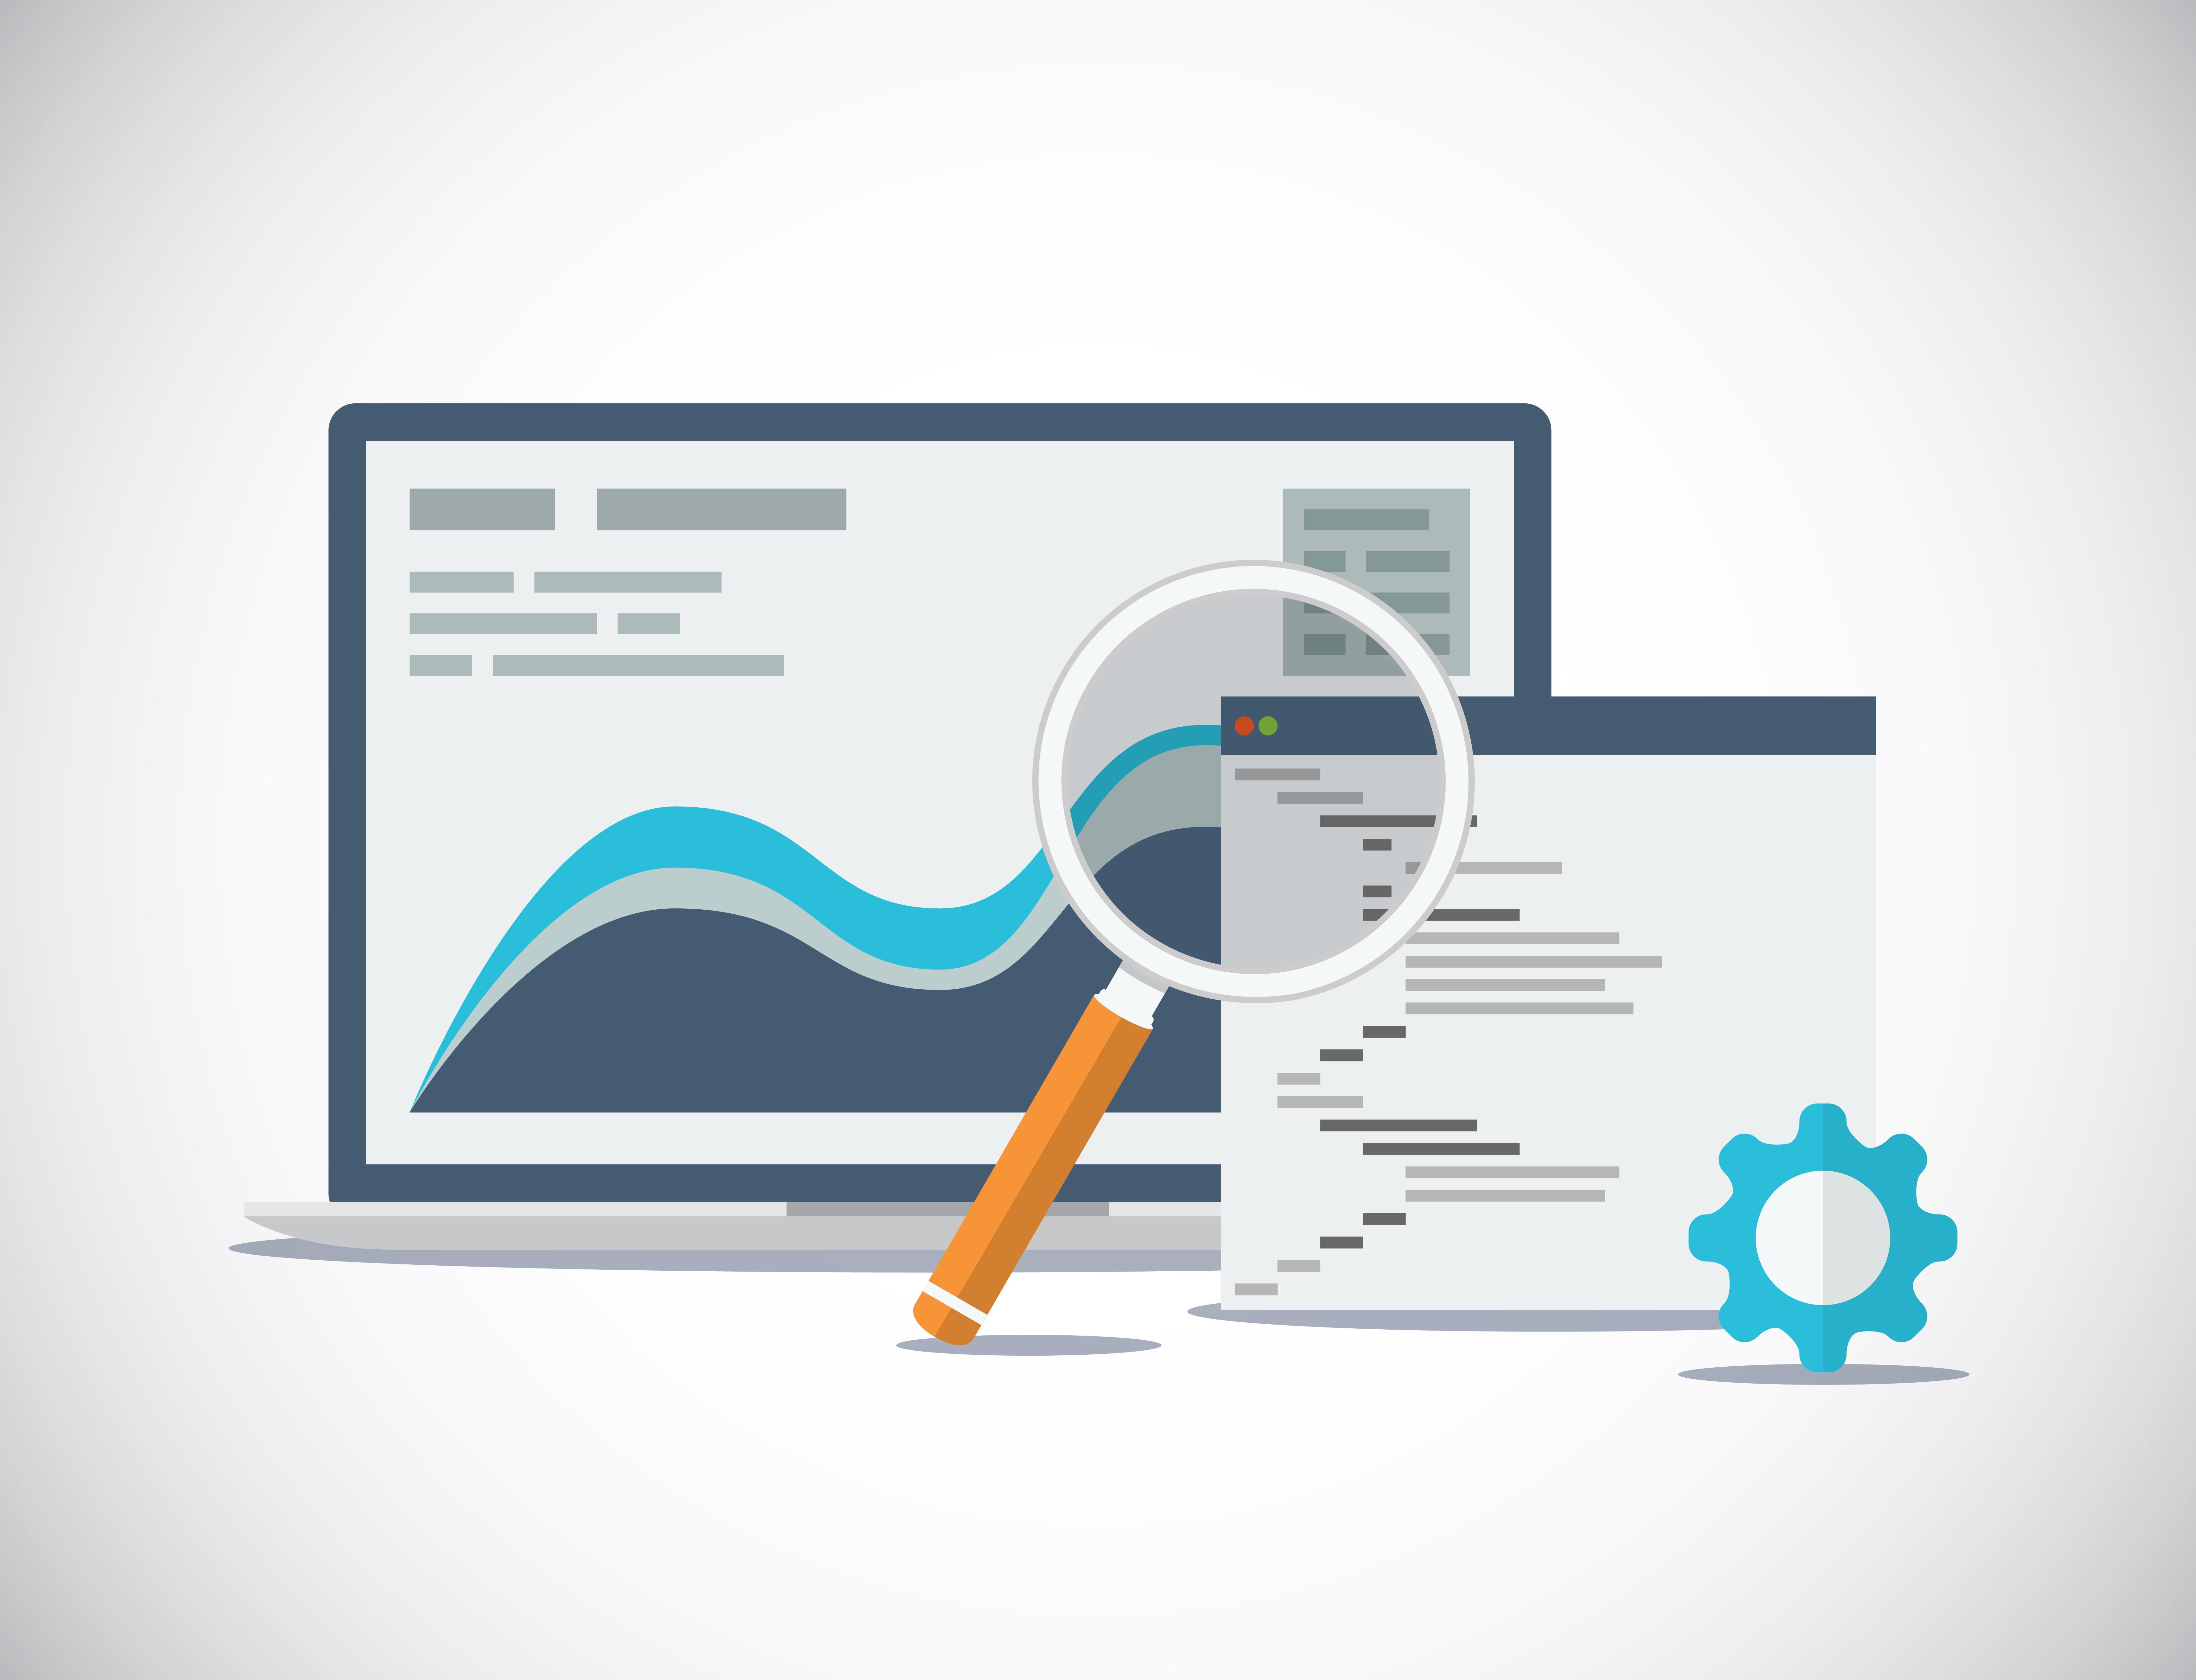 Top 2020 Strategies for Website Optimization